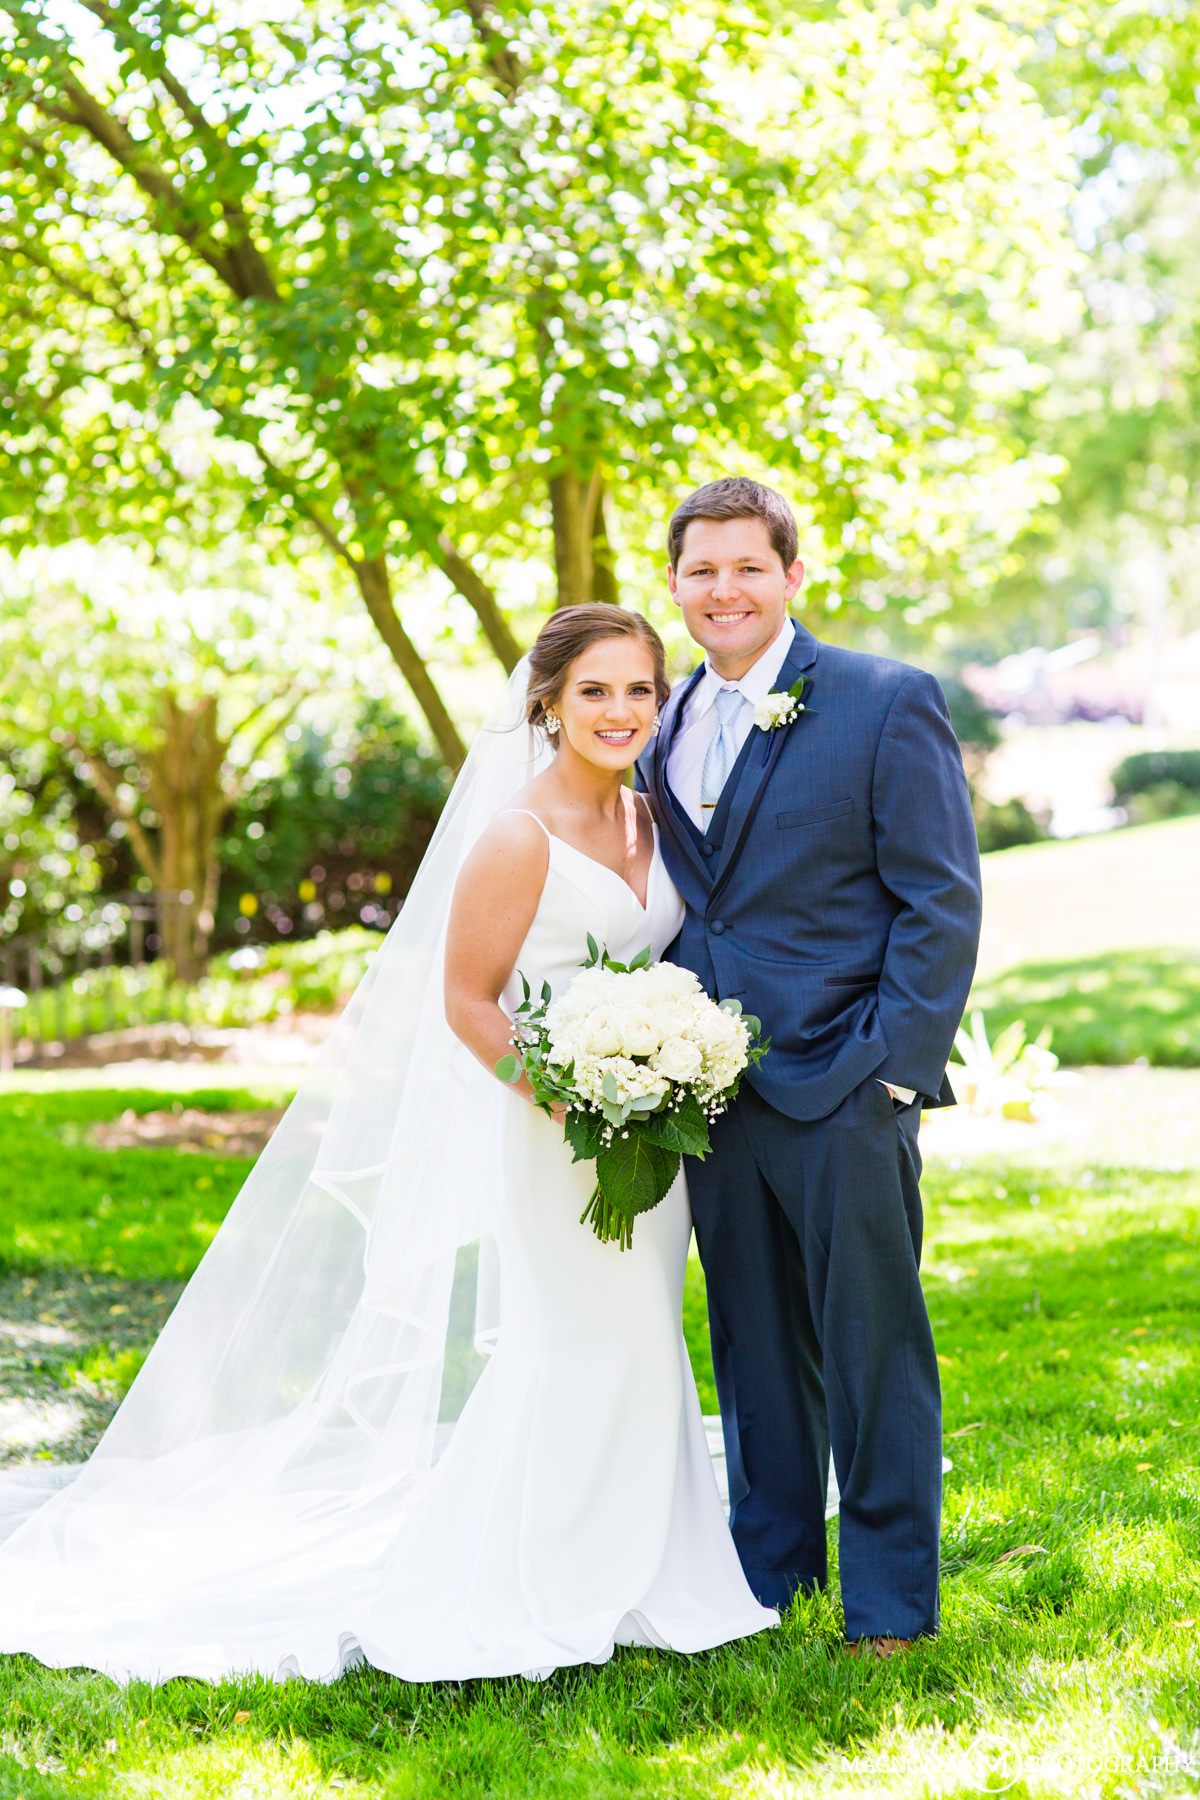 The Carolina Inn Wedding Photographer | Taylor + Corey Married